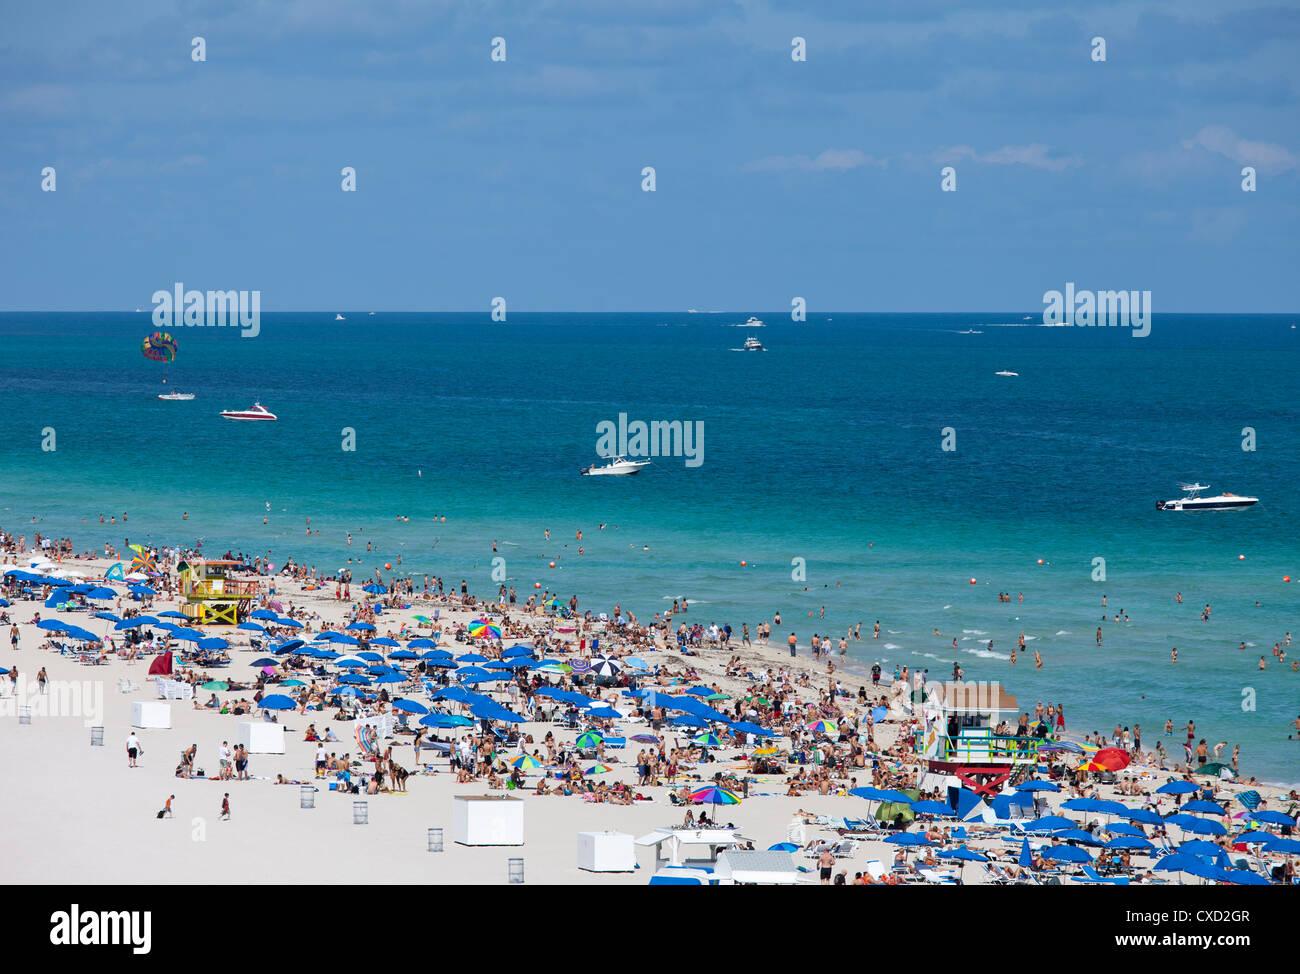 Crowded beach, South Beach, Miami Beach, Florida, United States of America, North America - Stock Image